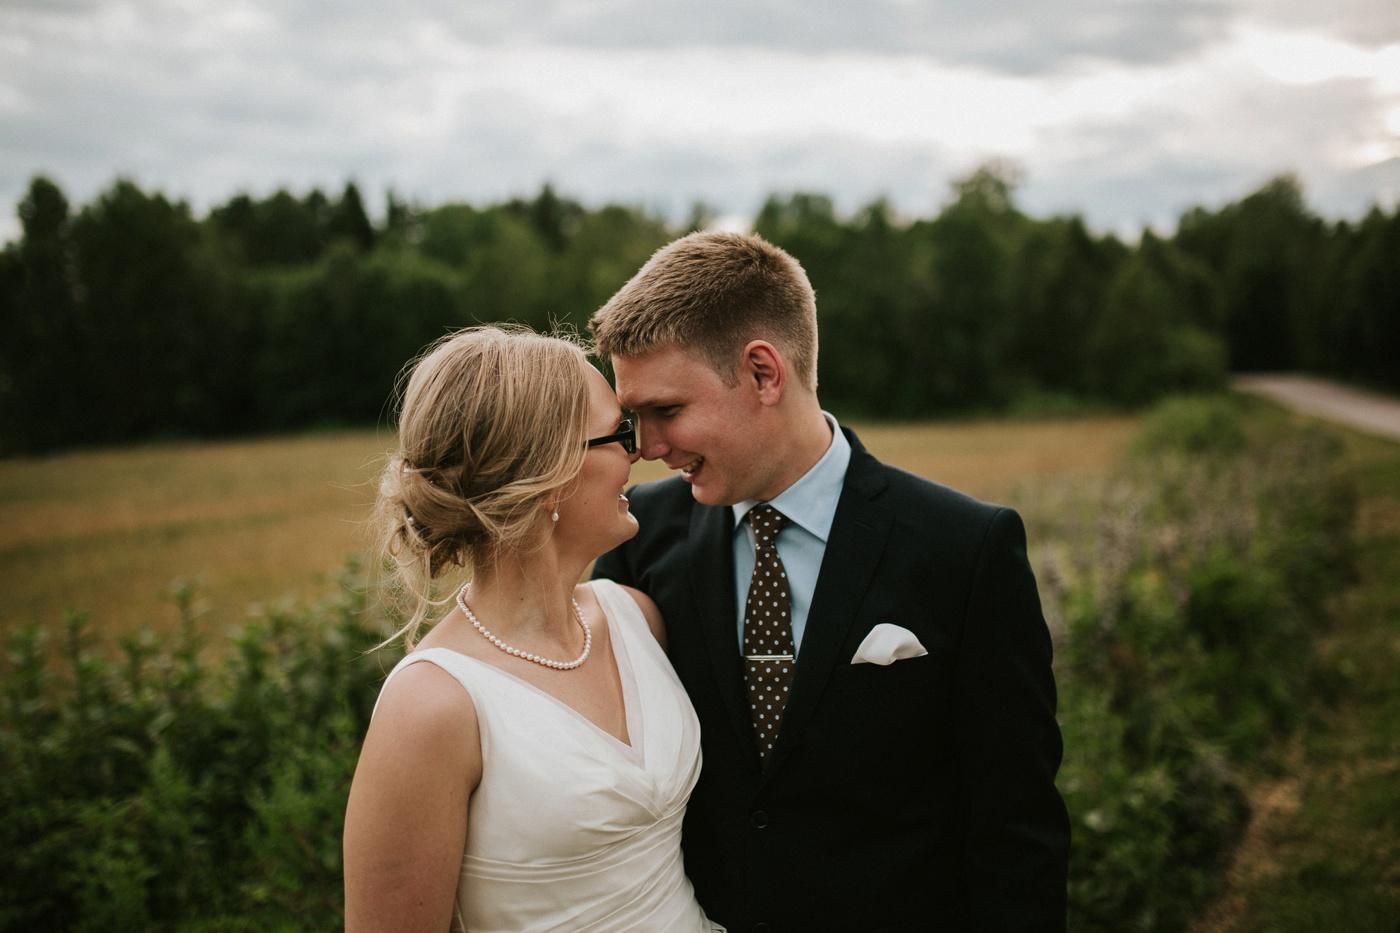 ceciliajoakim_sweden-countryside-summer-wedding_melbourne-fun-quirky-wedding-photography_90